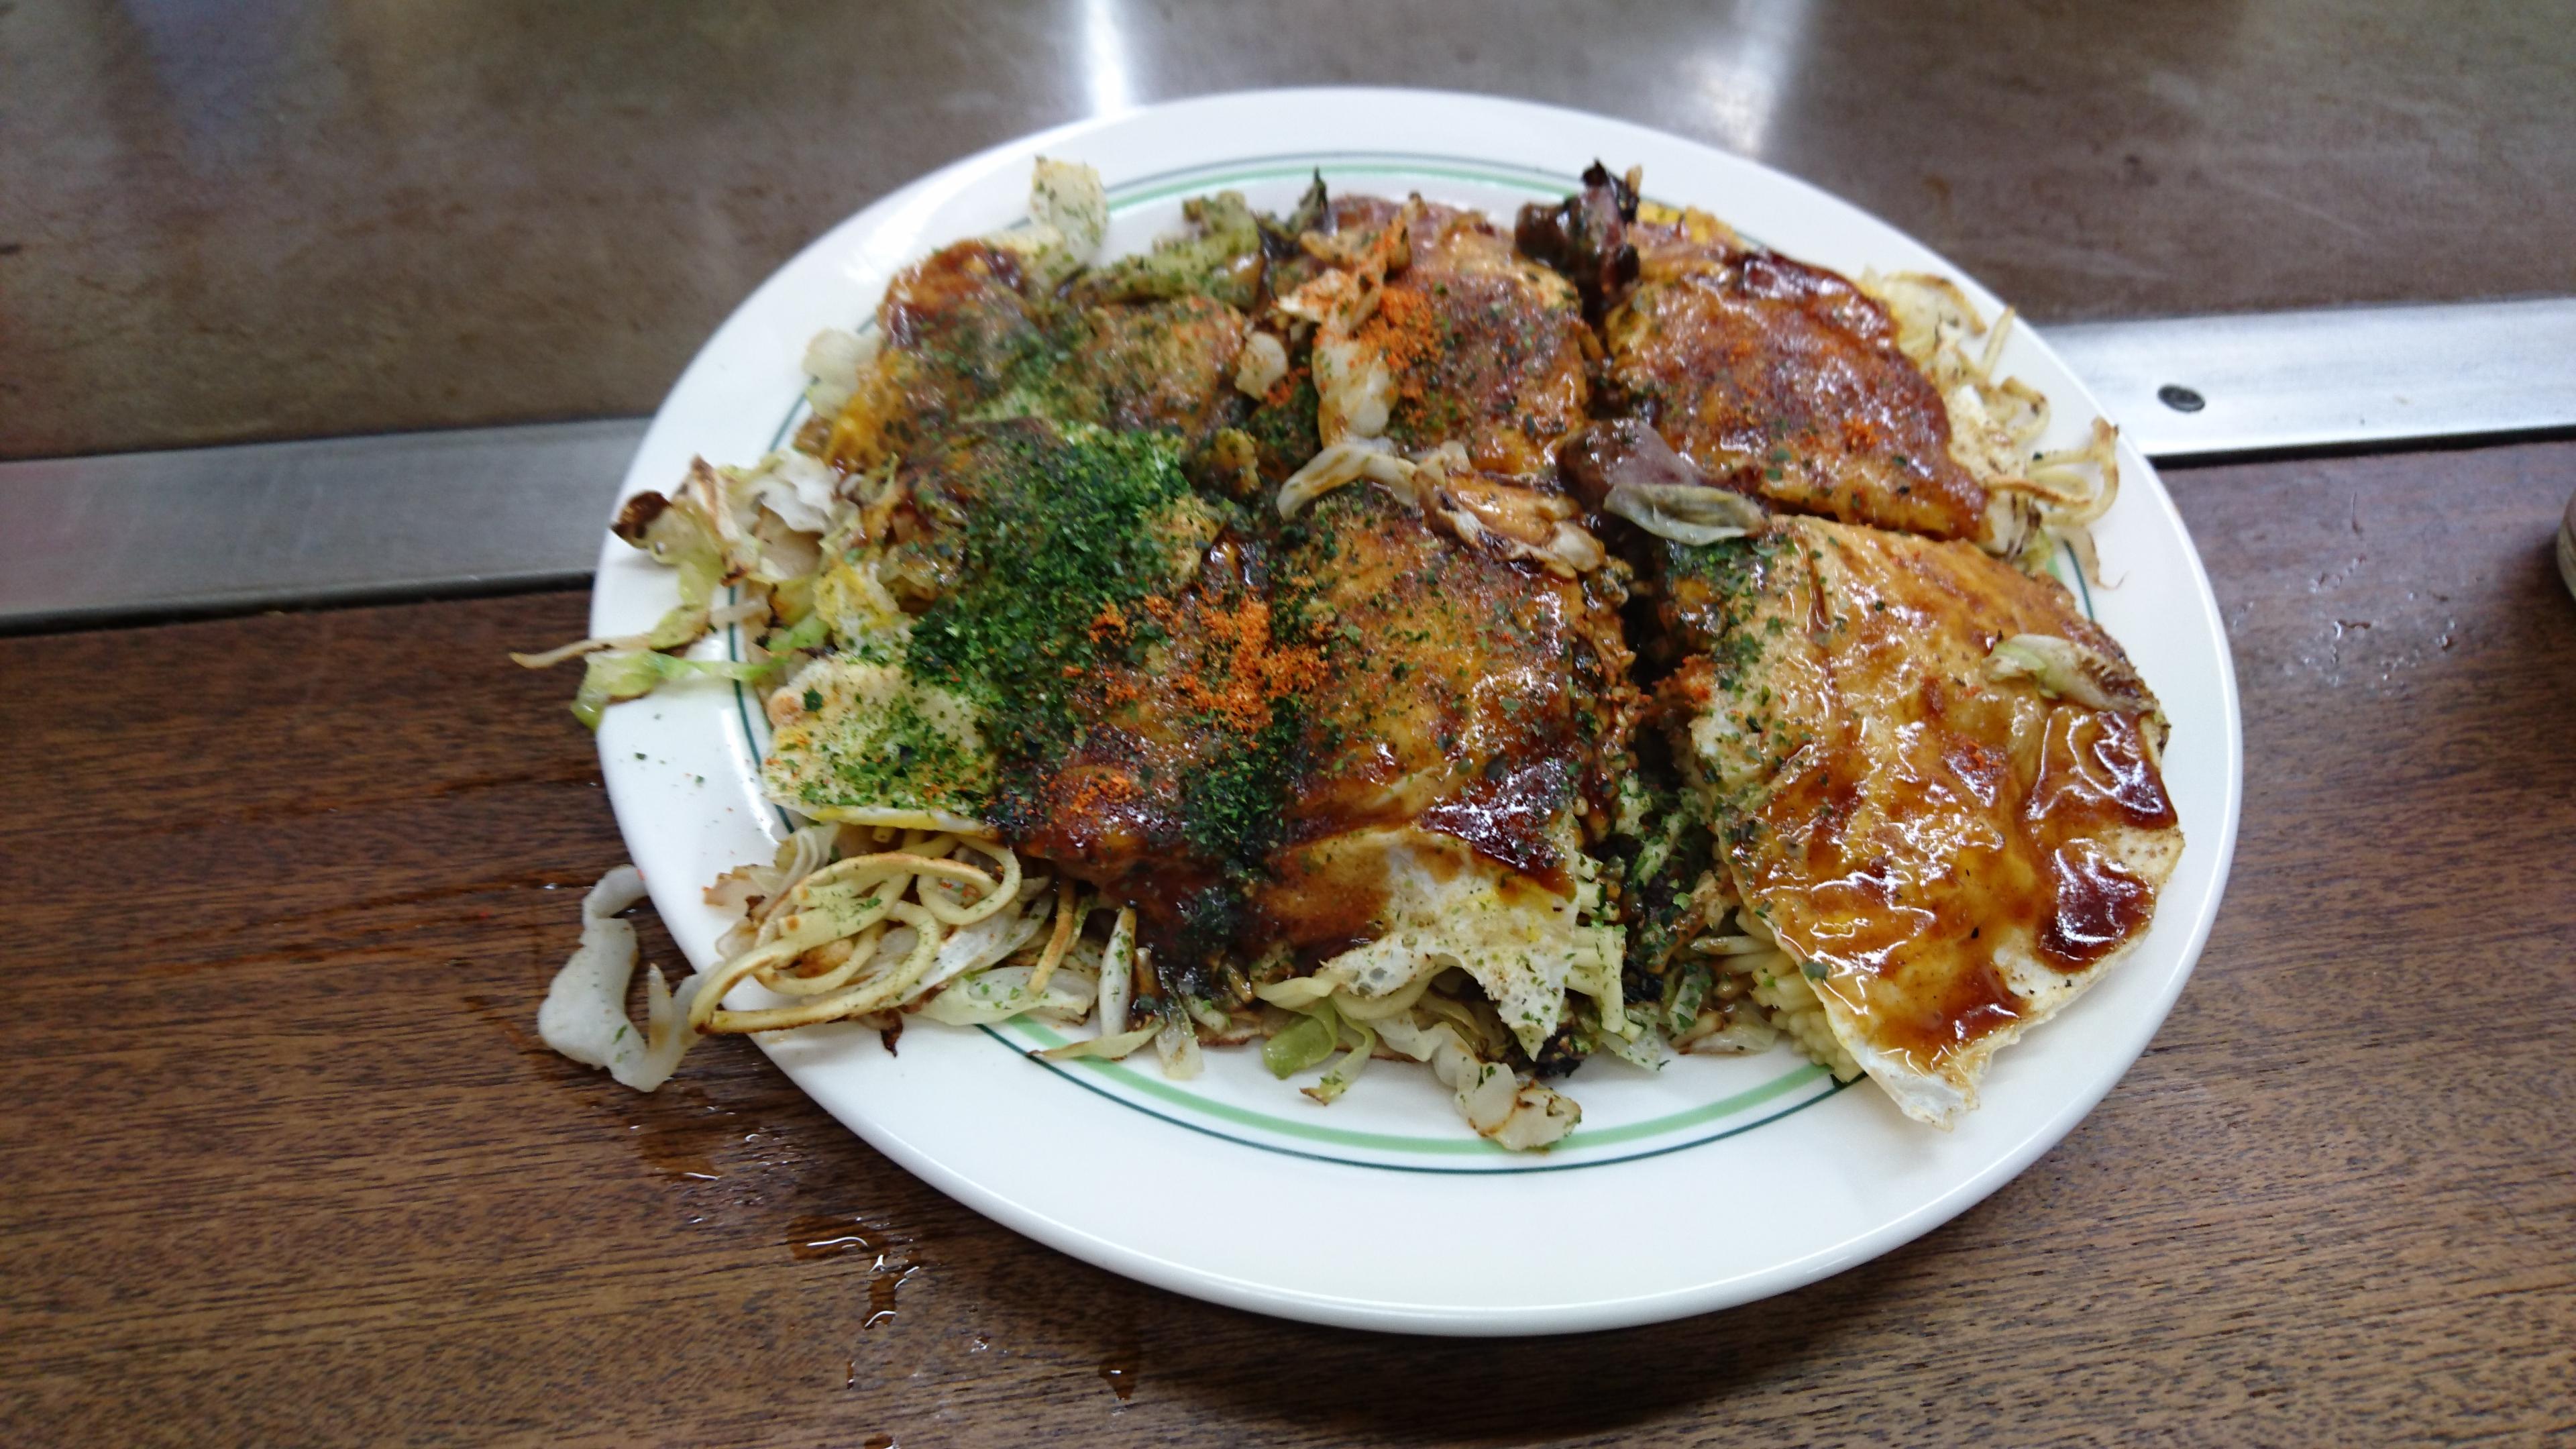 [Love 広島]お好み焼き編(2) 広島県内のご当地のお好み焼きを知ろう!